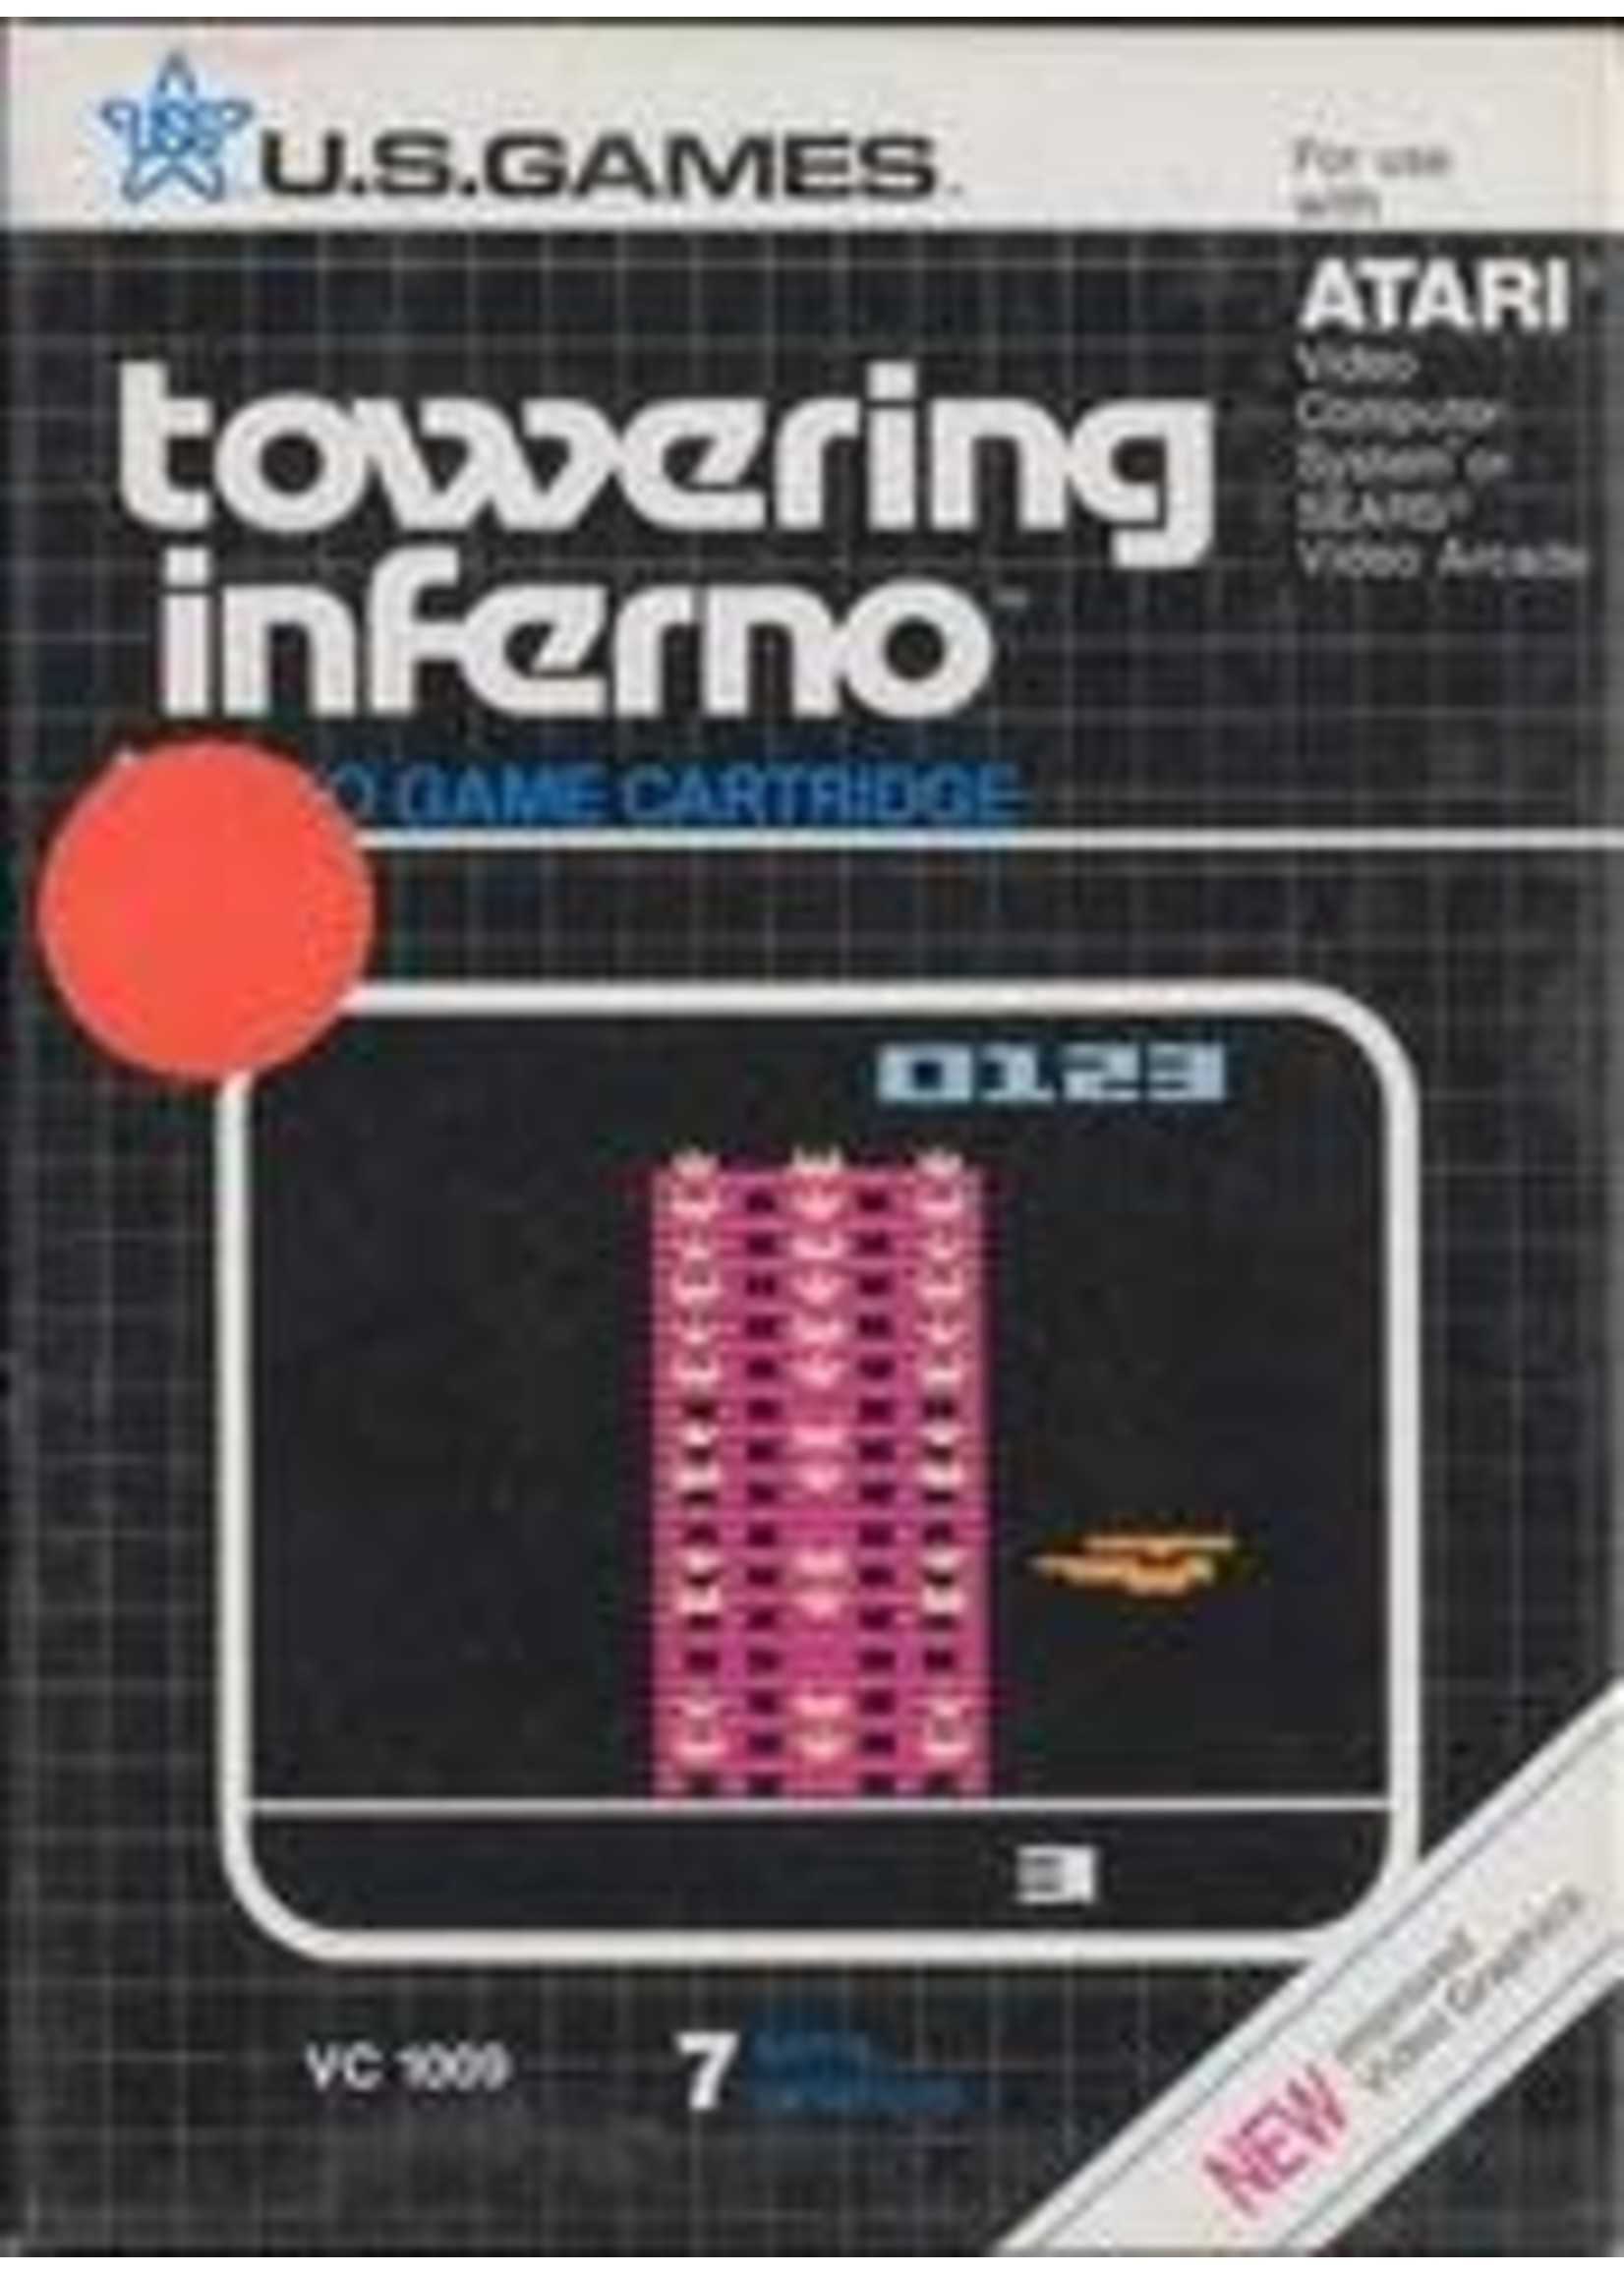 Towering Inferno Atari 2600